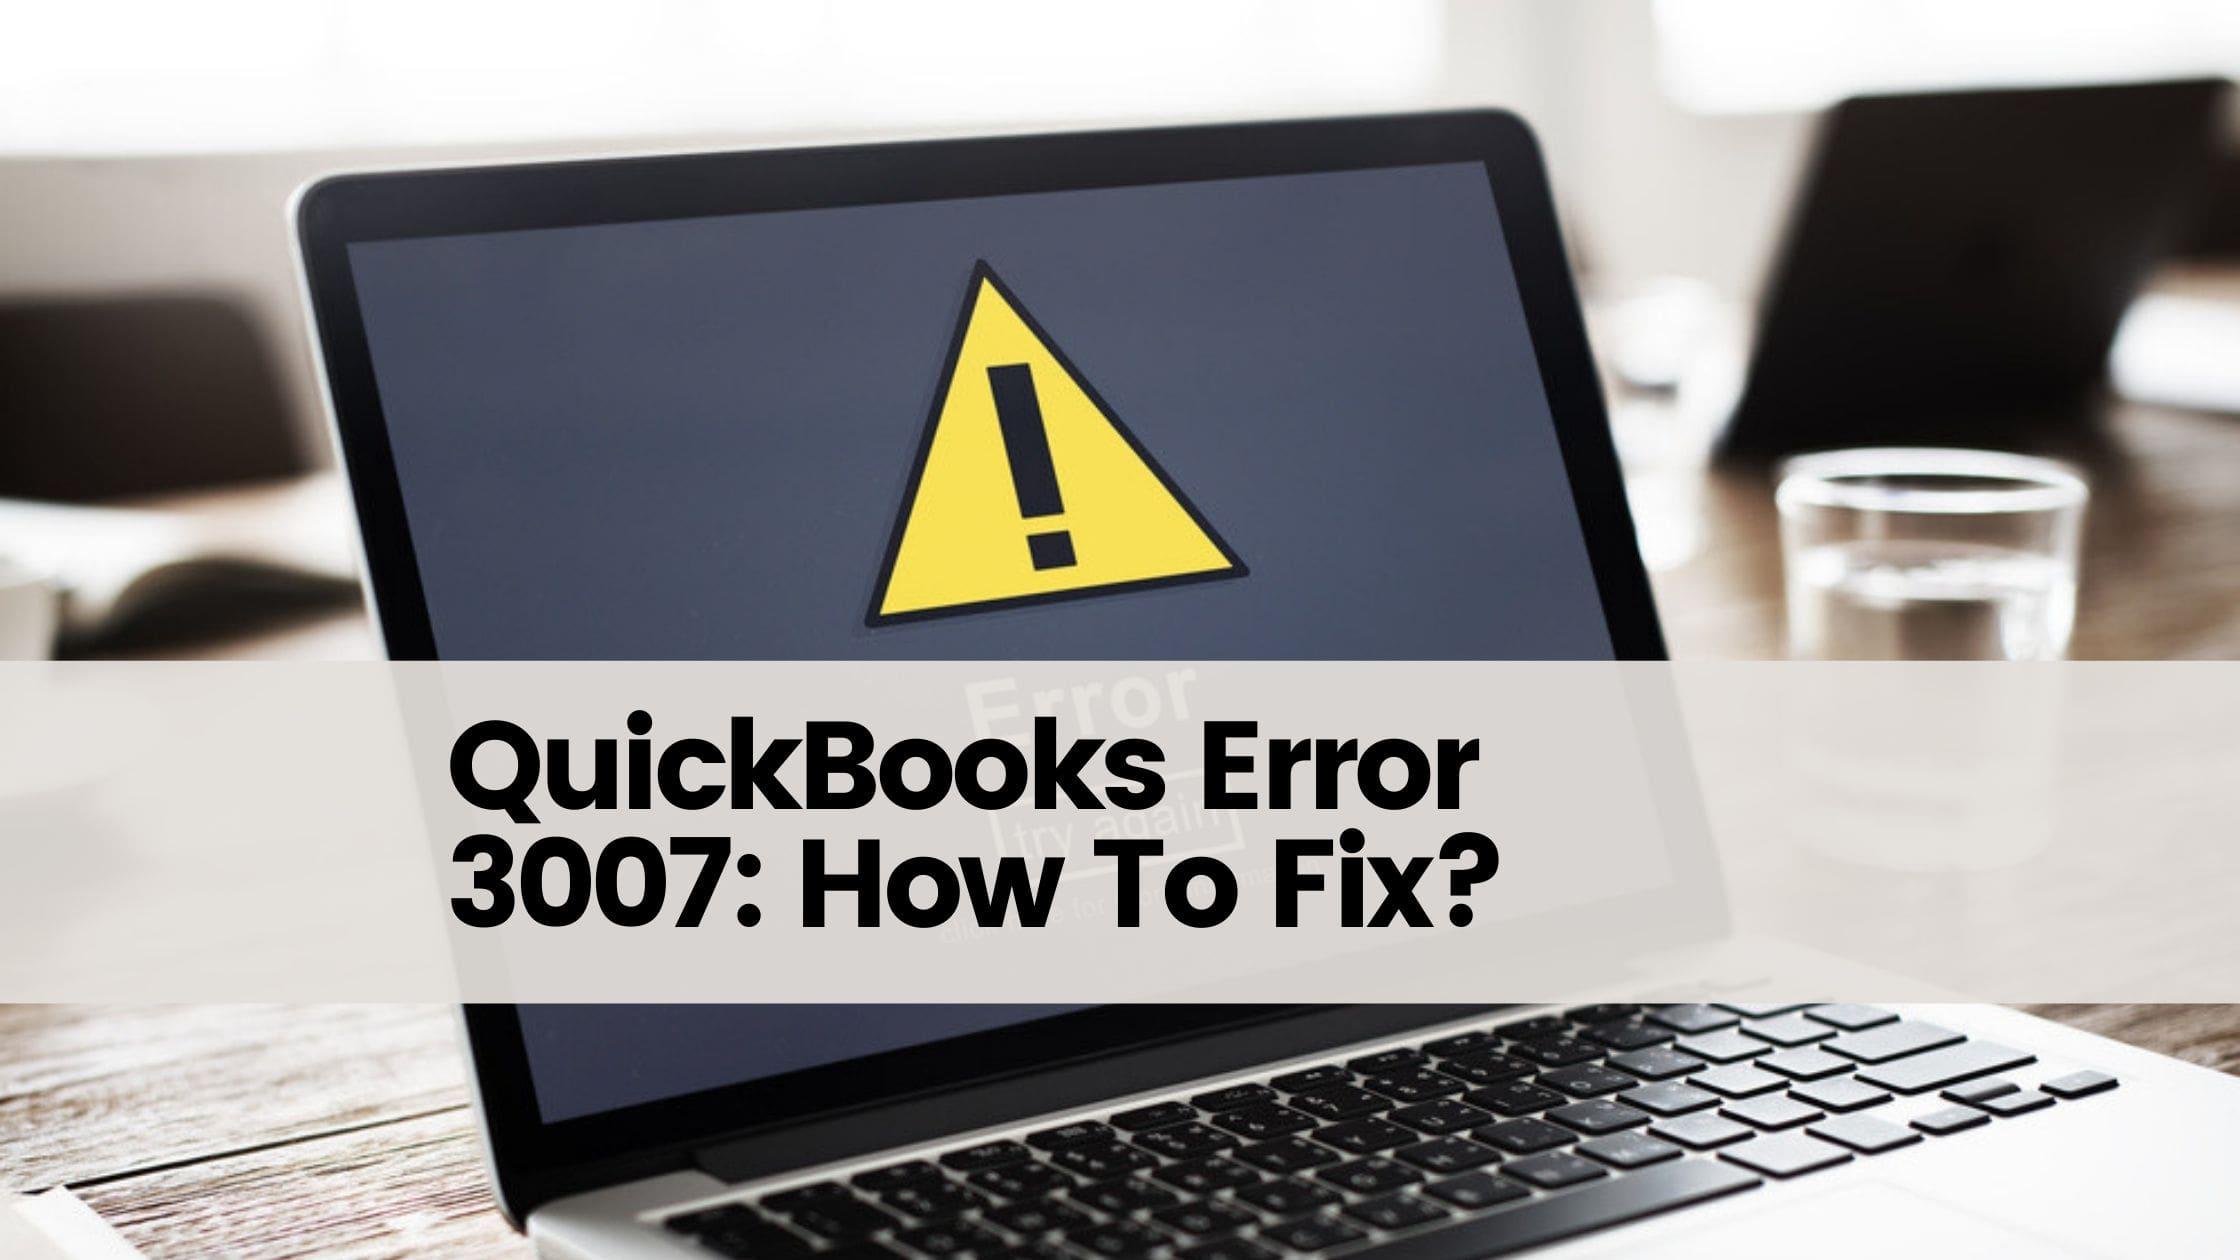 QuickBooks Error 3007: How To Fix?